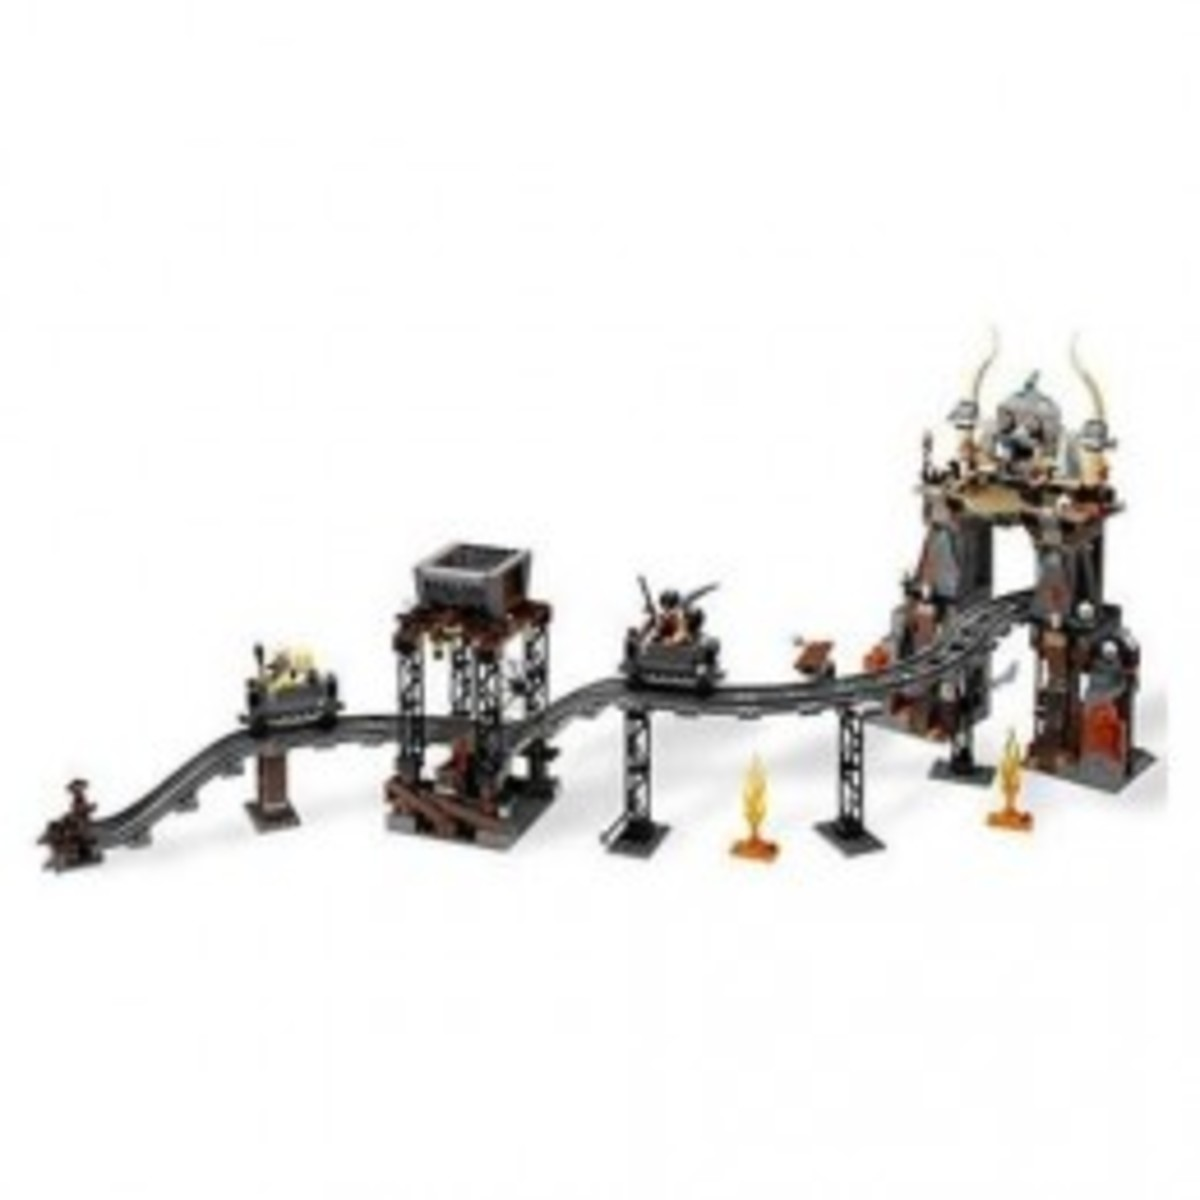 Lego Indiana Jones The Temple of Doom 7199 Assembled